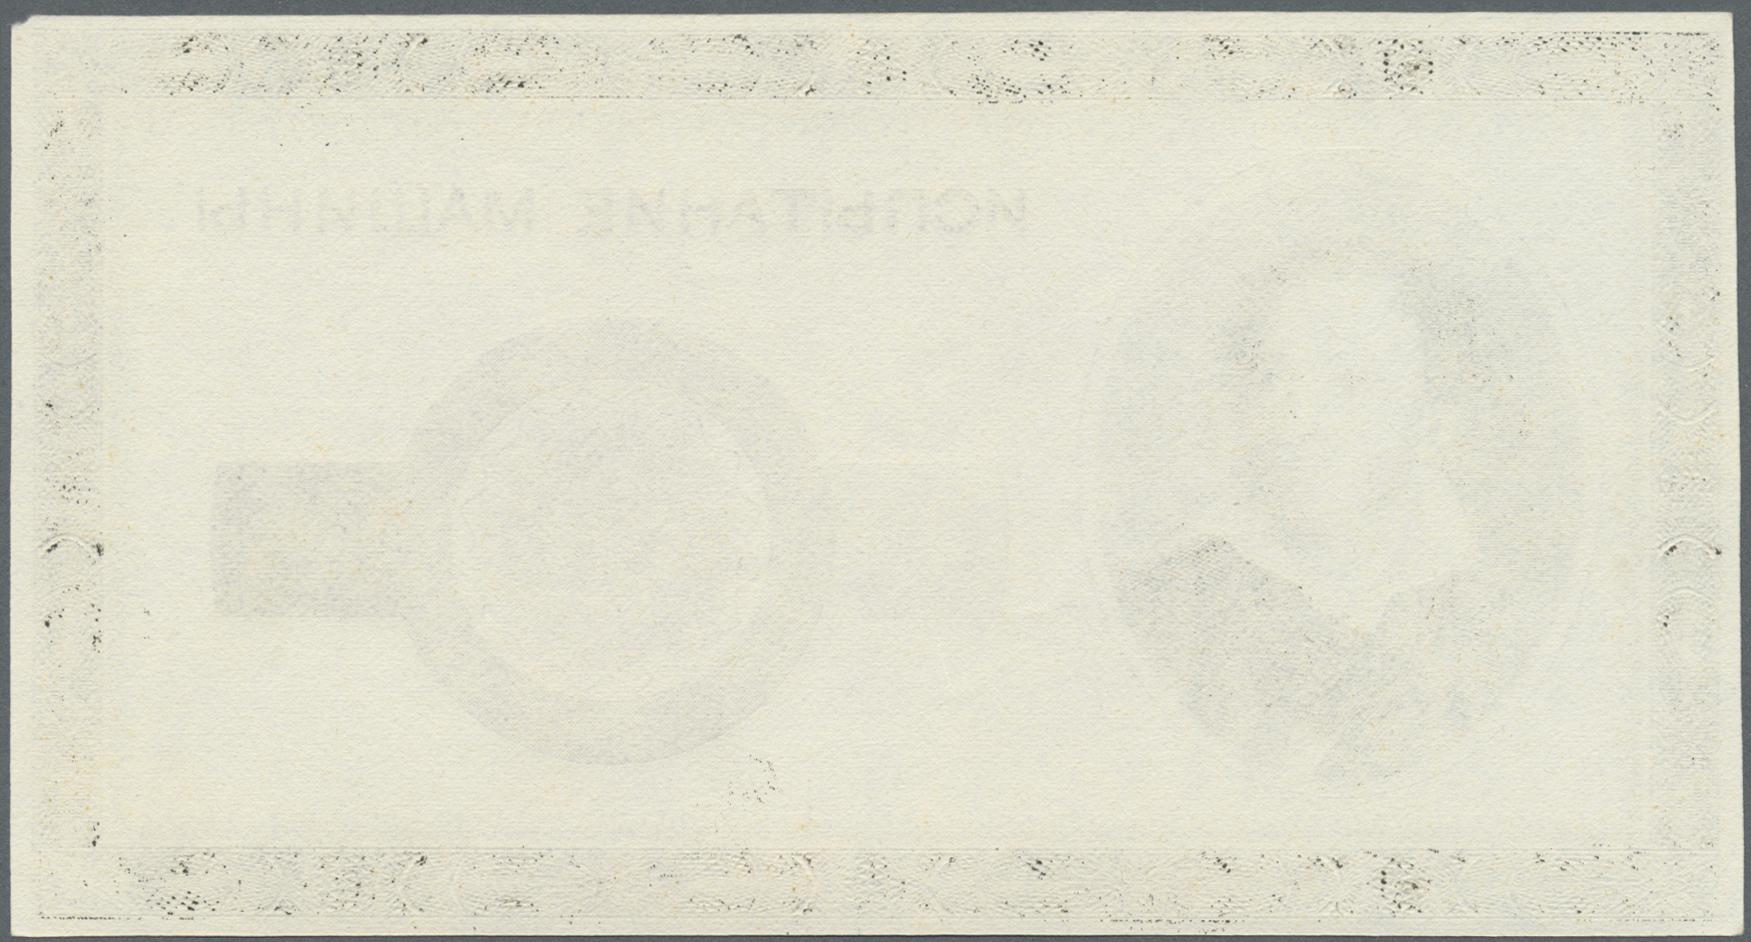 Lot 2314 - Testbanknoten | Banknoten  -  Auktionshaus Christoph Gärtner GmbH & Co. KG Banknotes & Coins Auction #39 Day 2